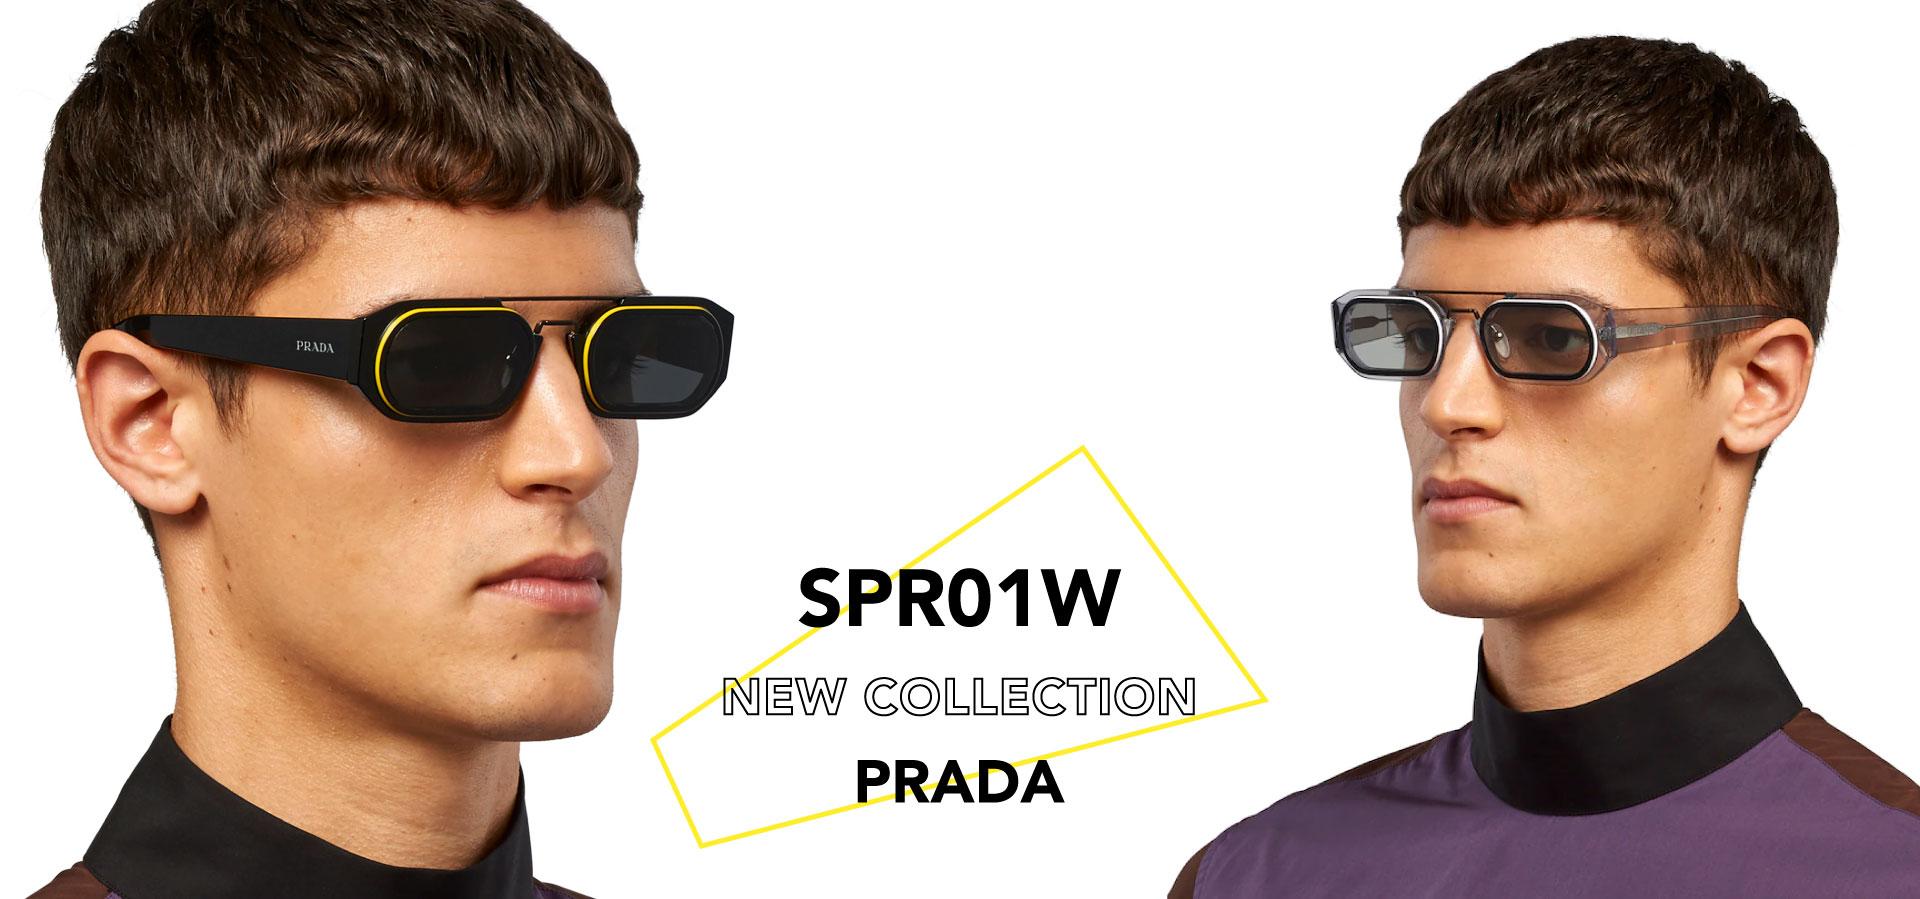 Prada Sunglasses   New Collection